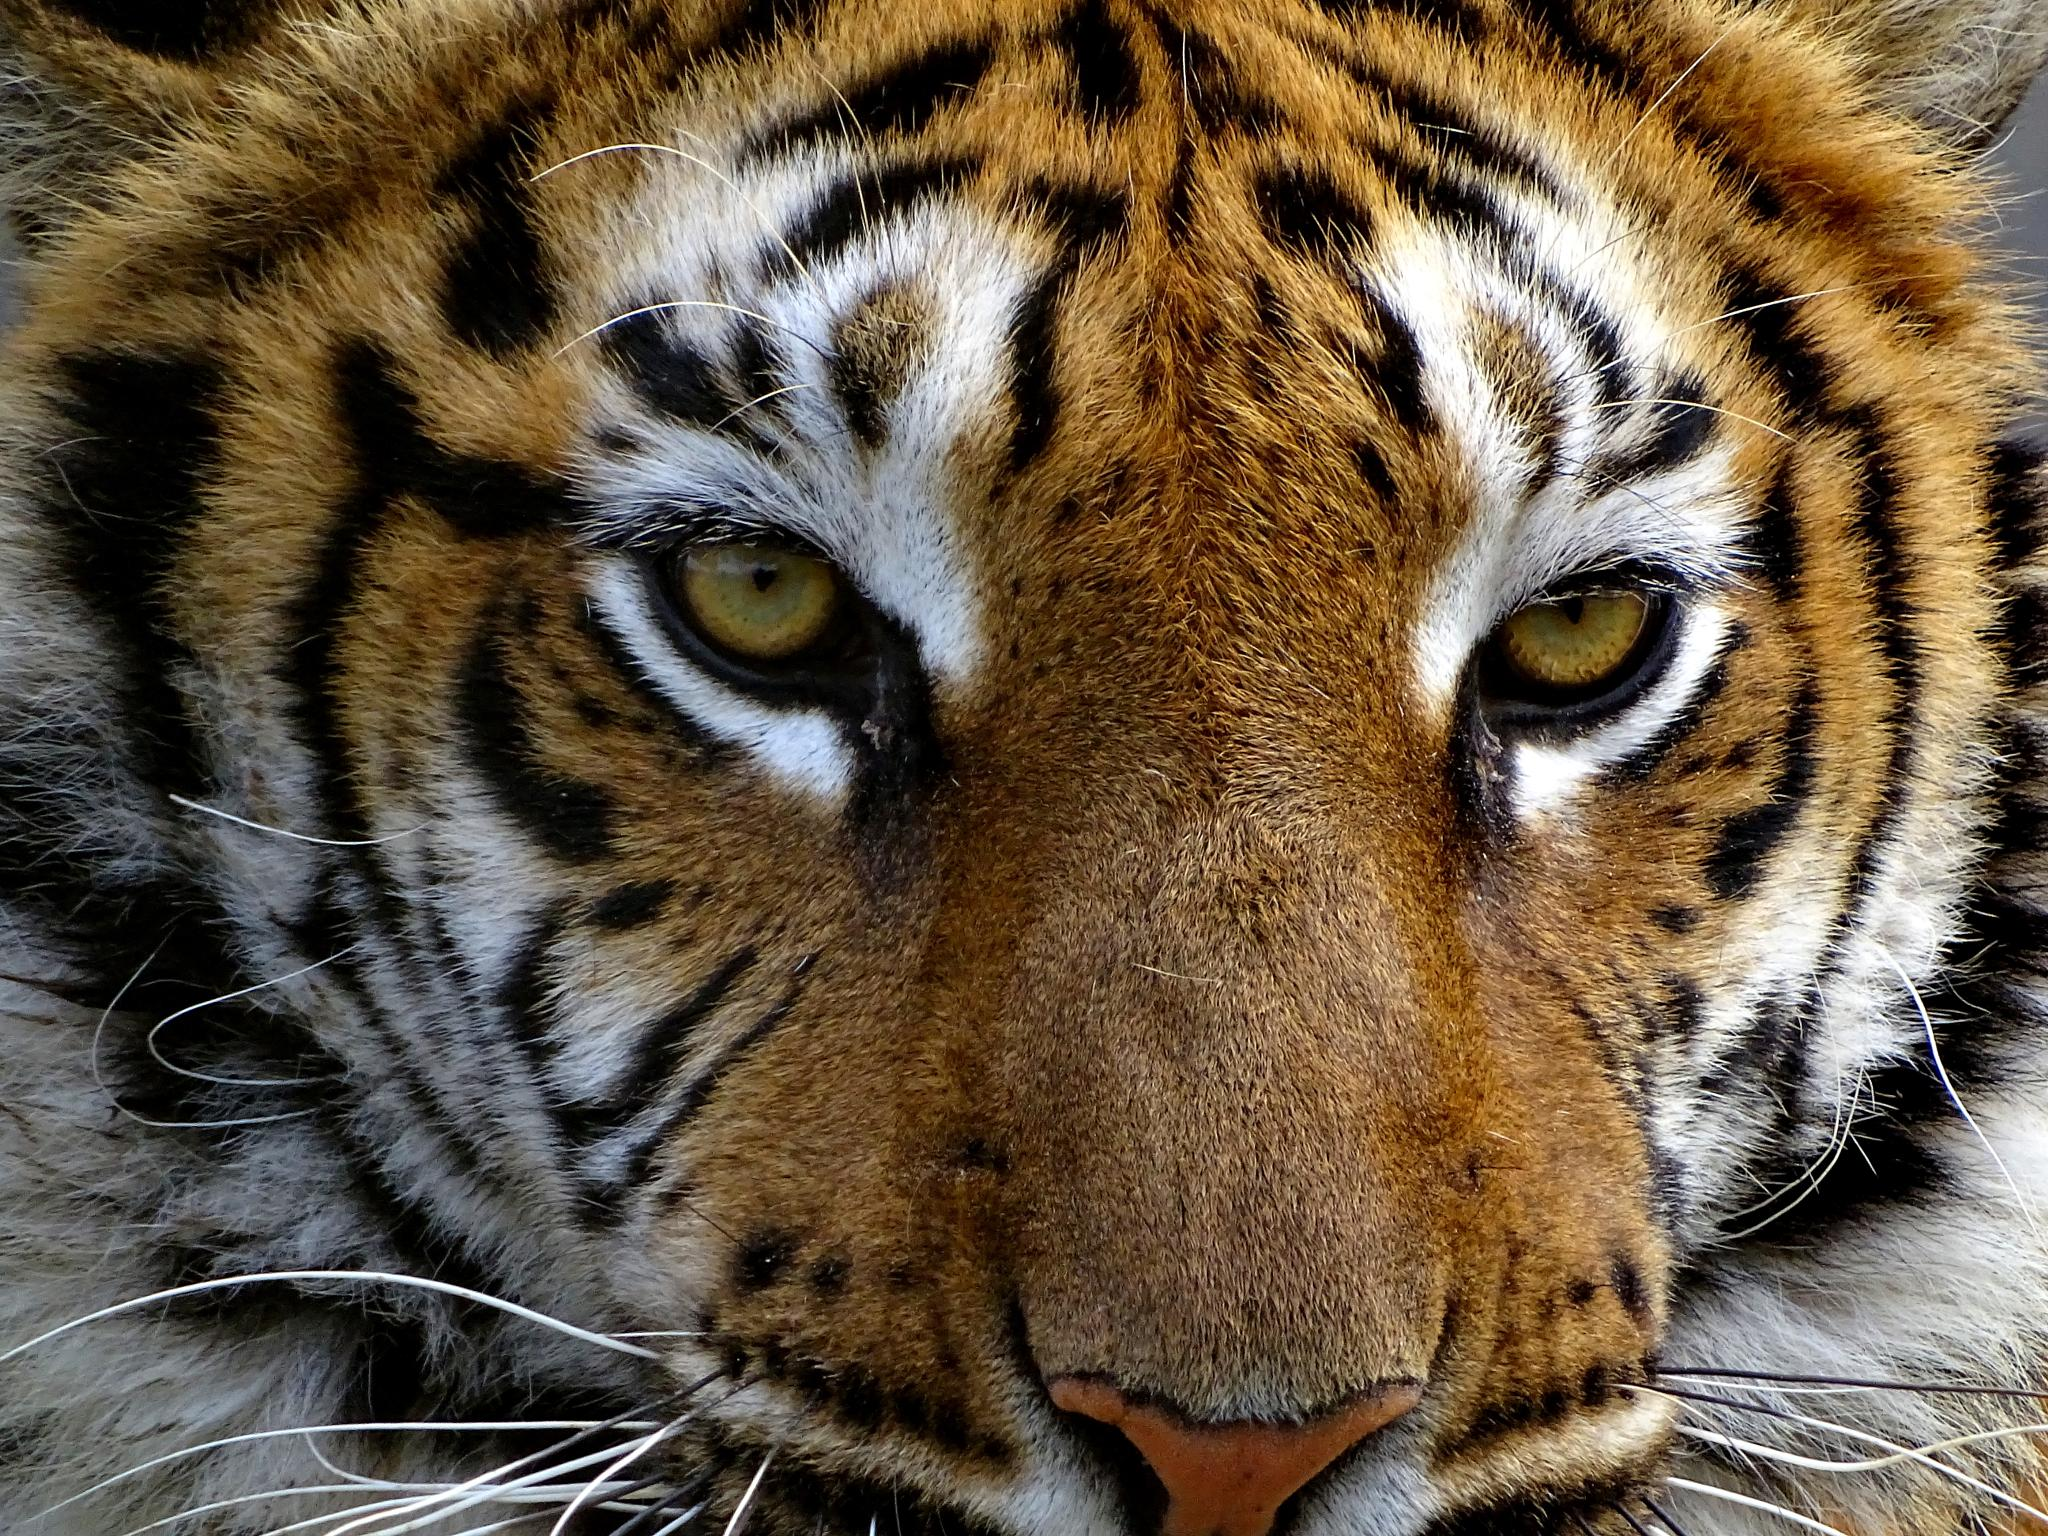 tiger by emine